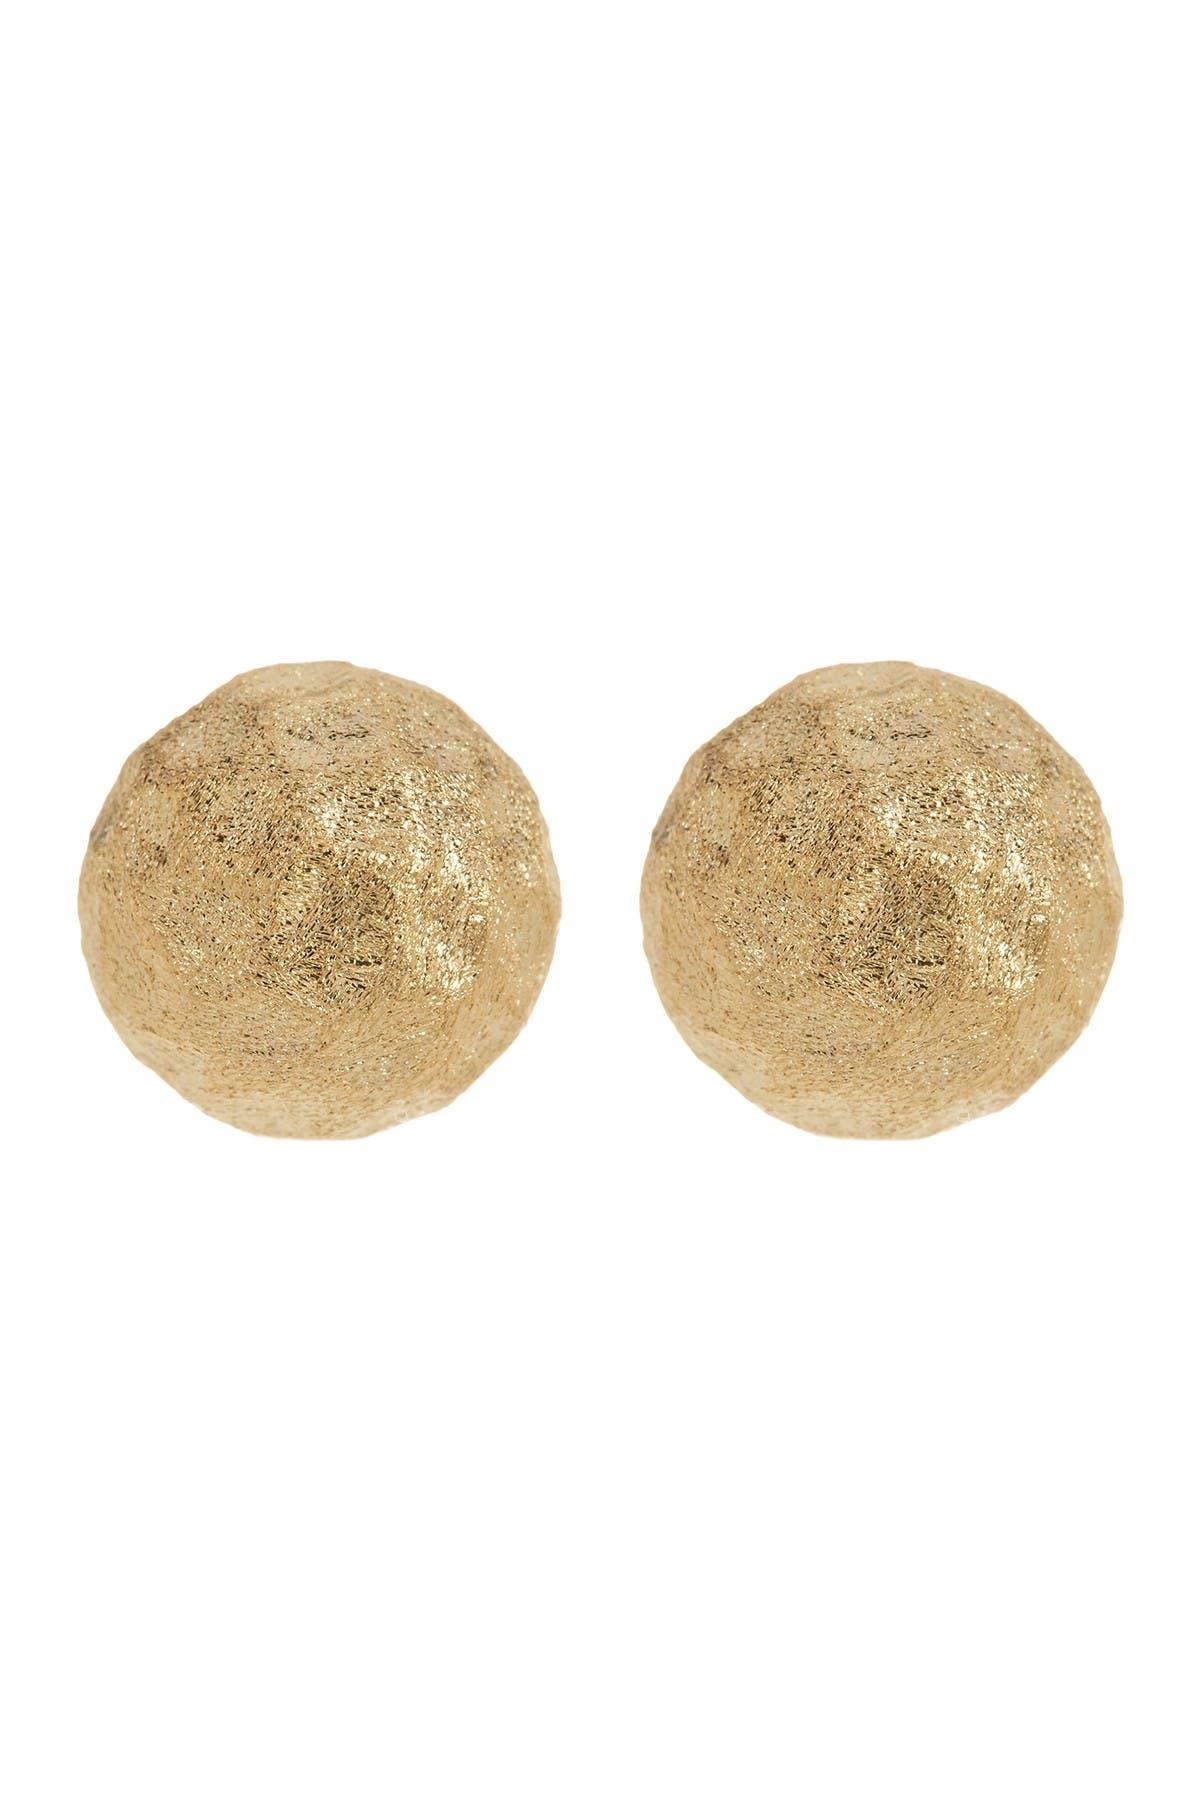 Image of Rivka Friedman 18K Gold Clad Hammered Ball Satin Stud Earrings